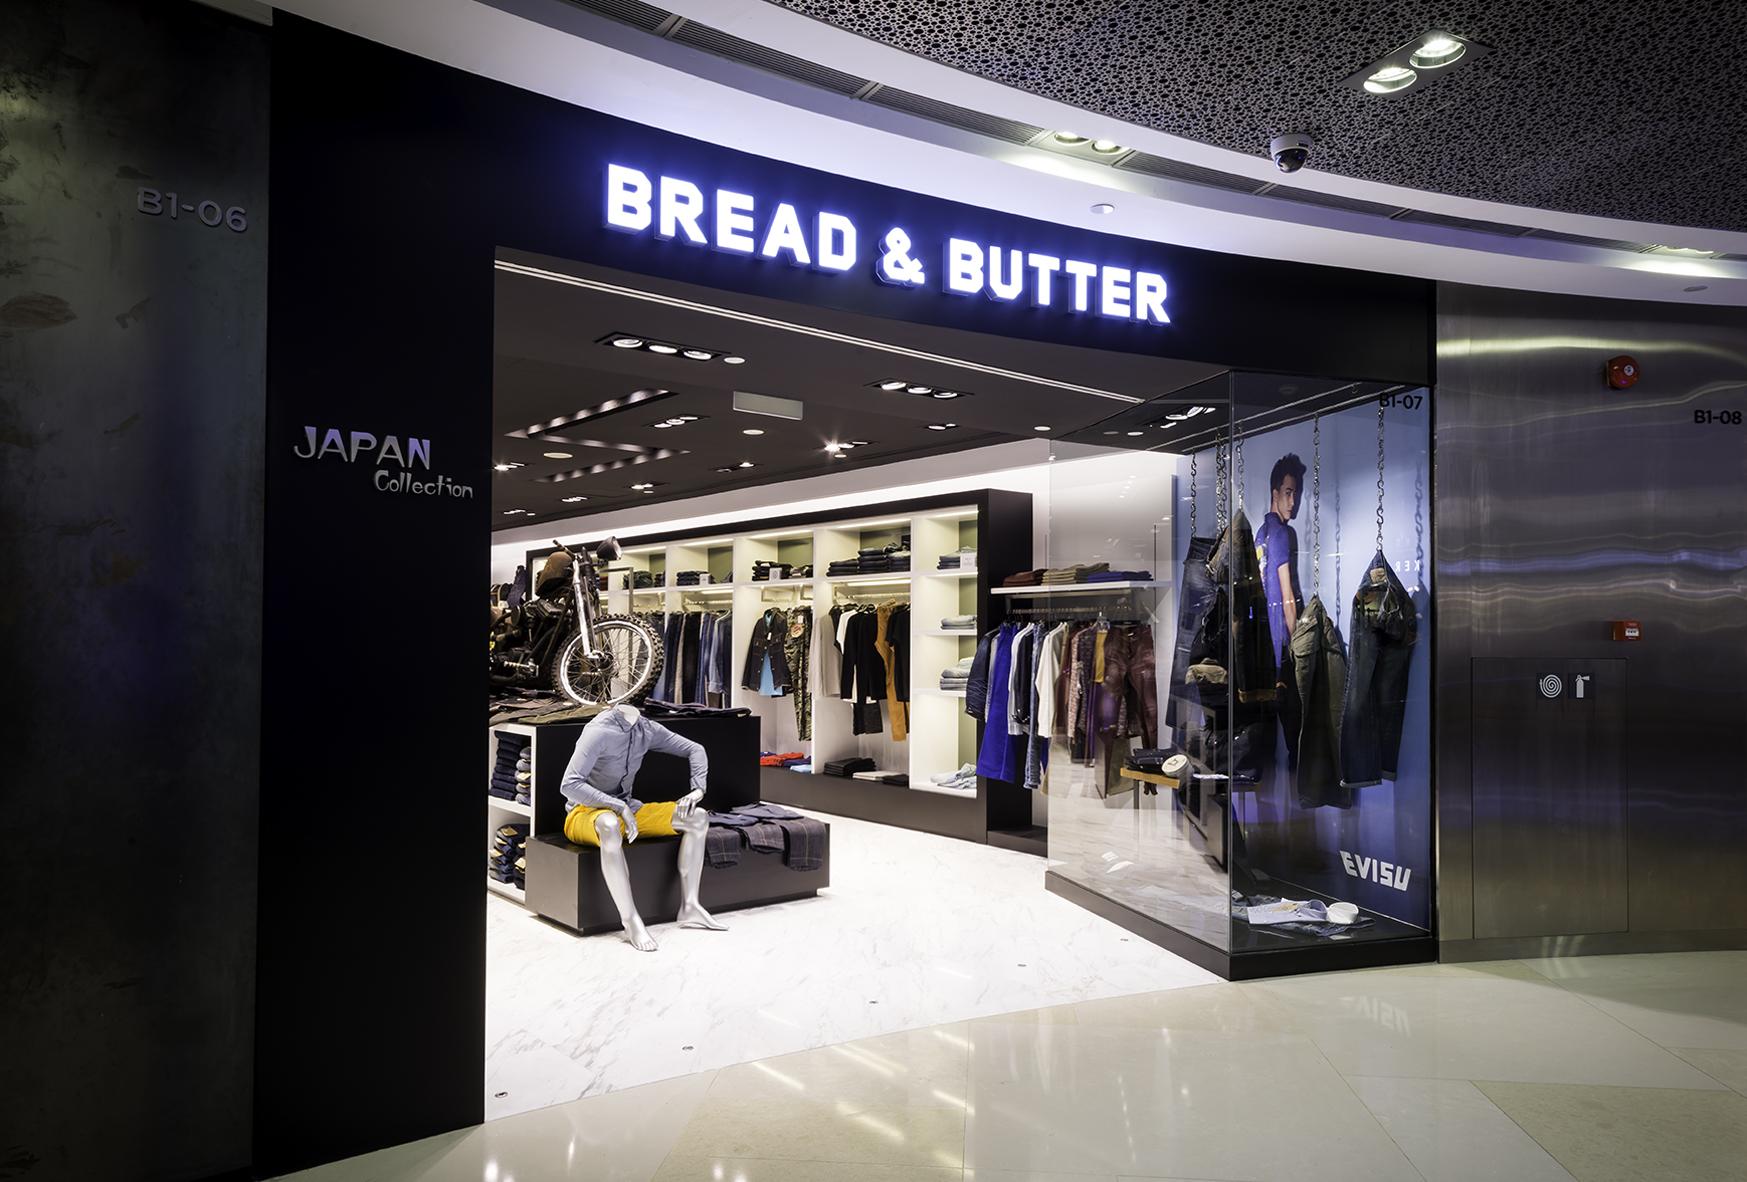 Cửa hàng Bread & Butter